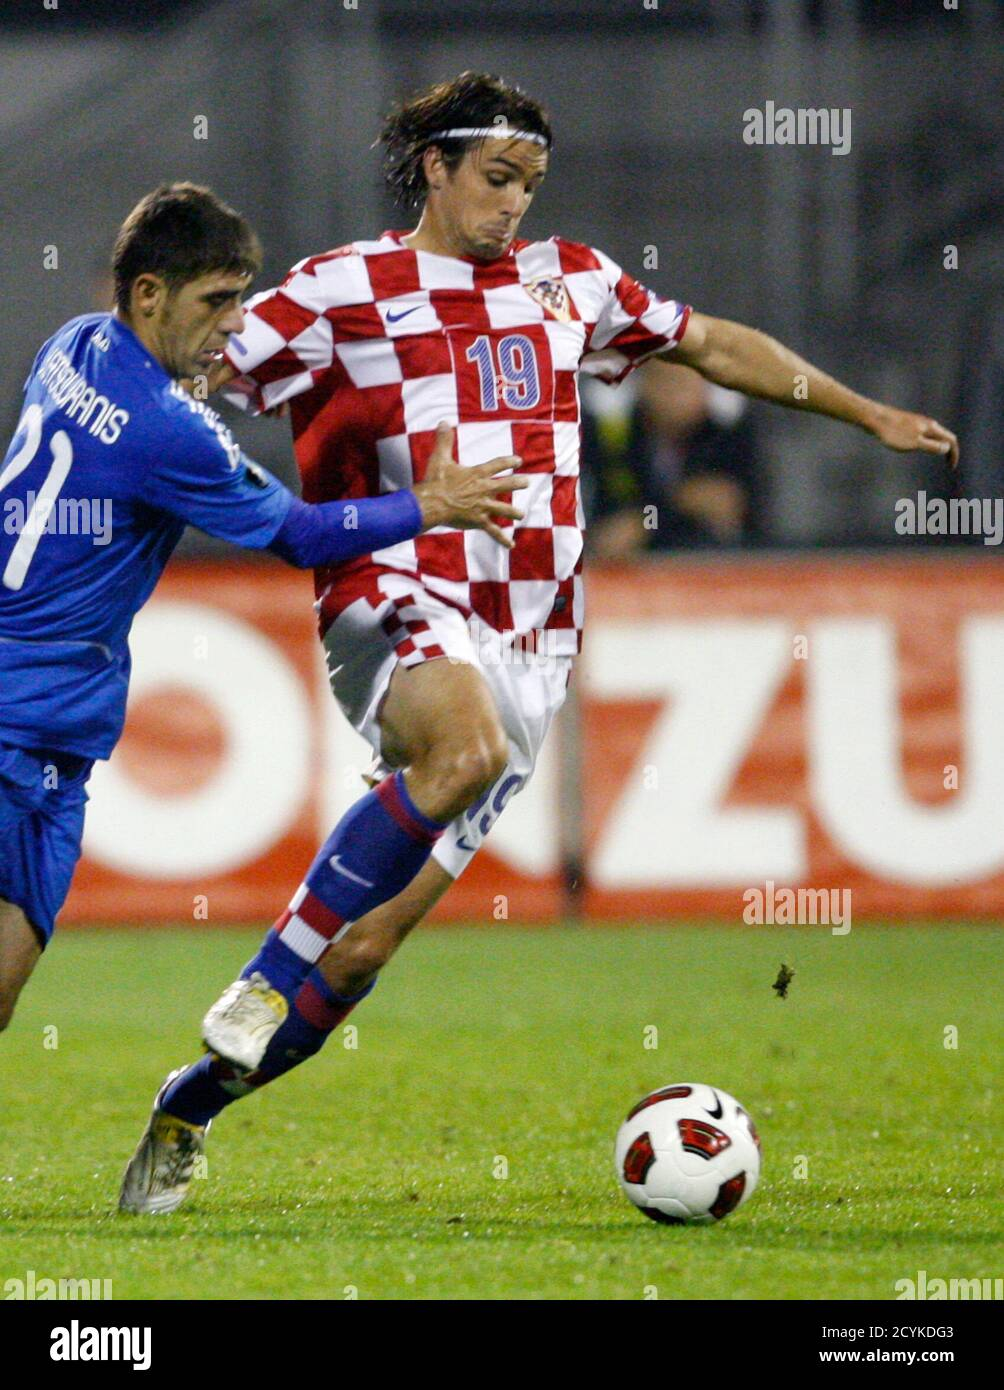 ganado Imperio Inca Juramento  Niko Kranjcar (R) of Croatia fights for the ball with Konstantinos  Katsouranis of Greece during their